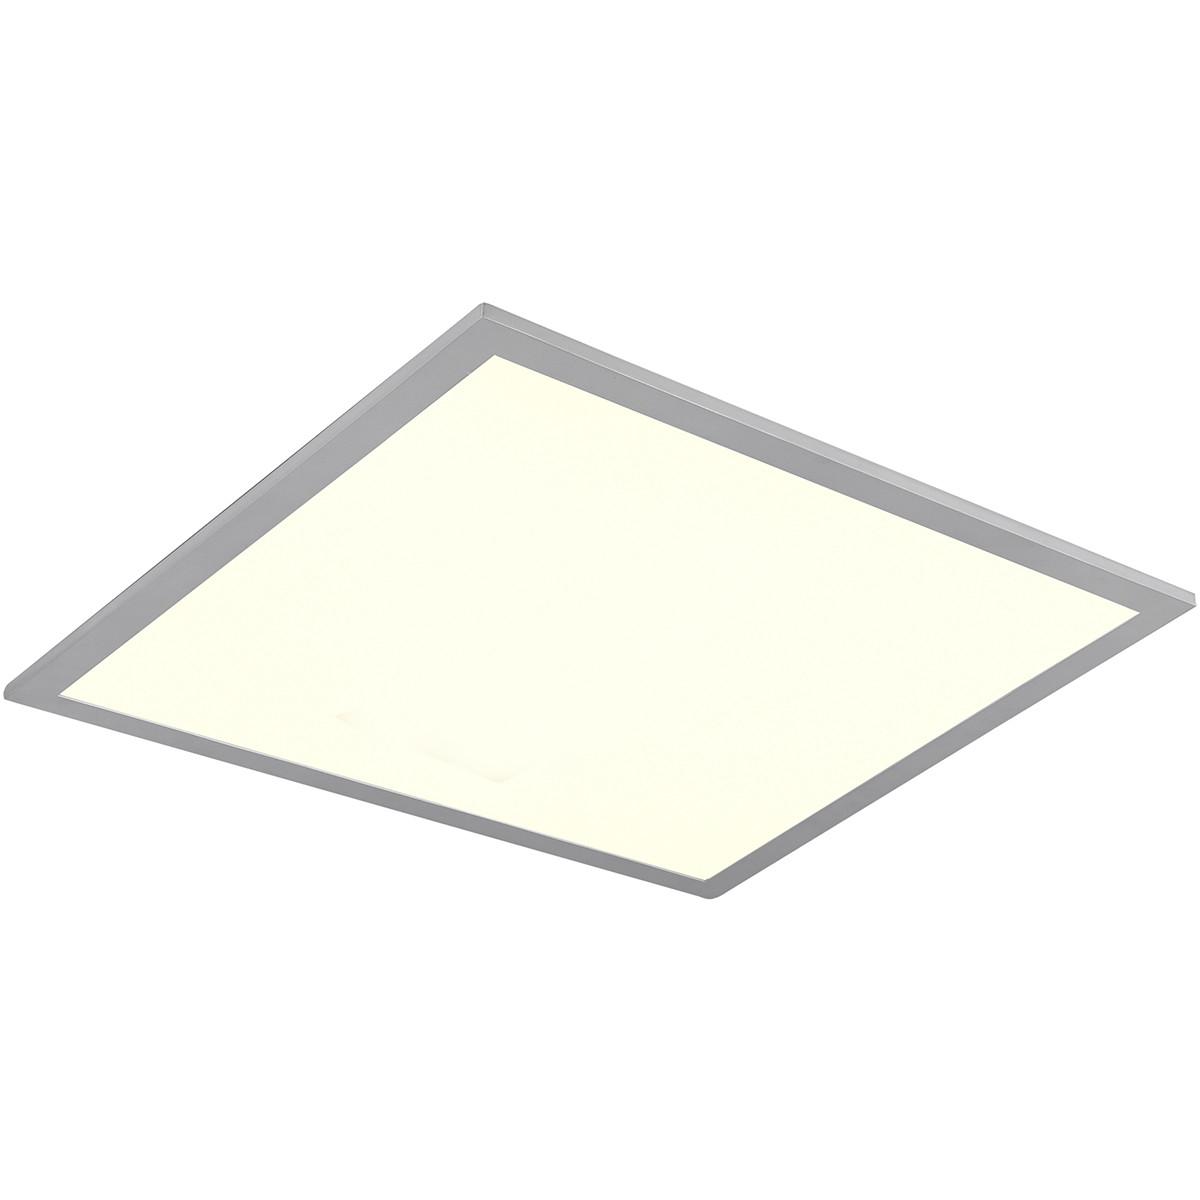 LED Plafondlamp WiZ - Trion Alineon - Slimme LED - Dimbaar - Aanpasbare Kleur - 22W - Mat Titaan - V